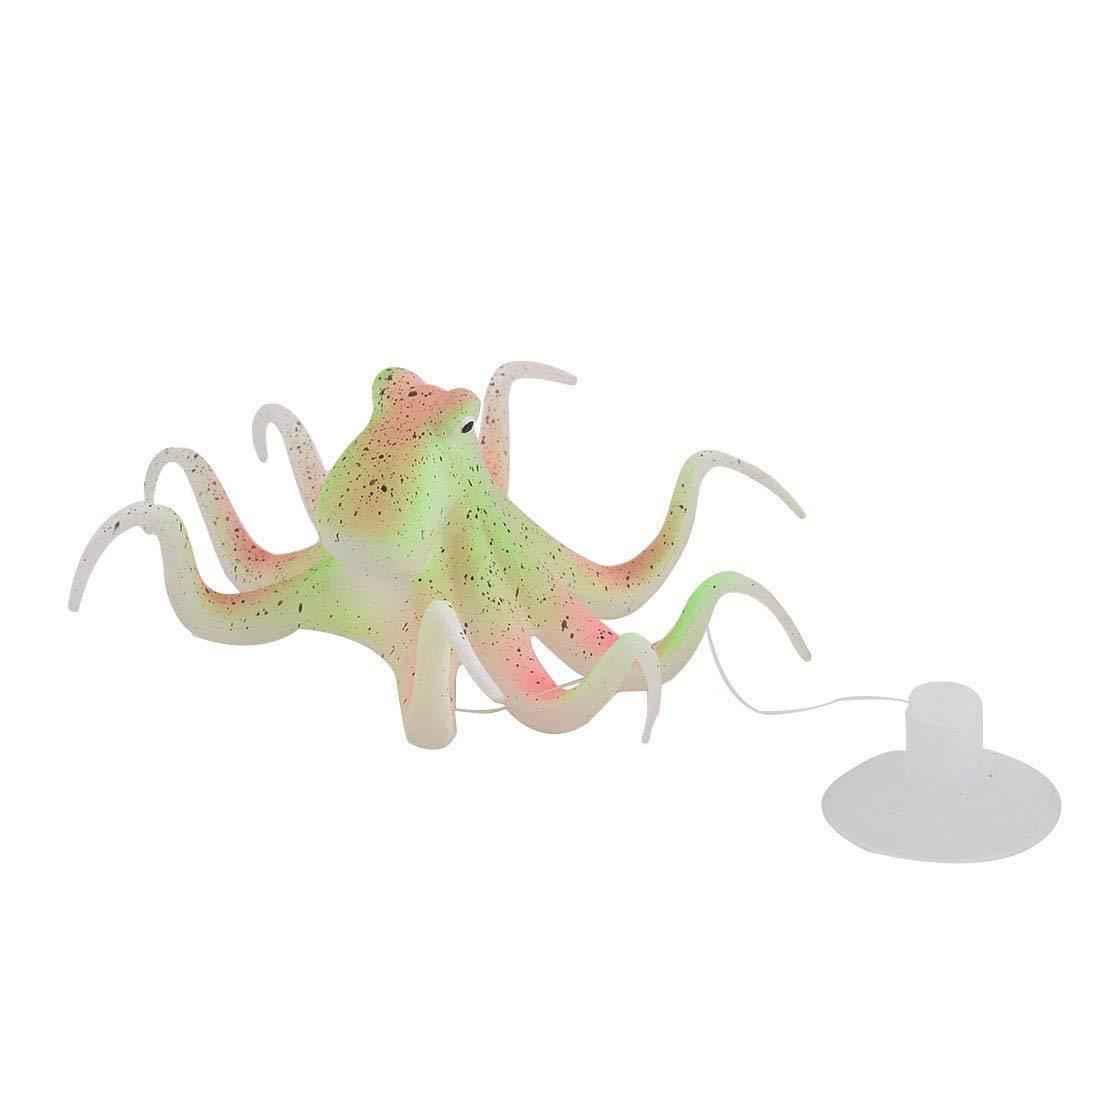 1Pc Silicone Fish Design Office Fish Tank Aquarium Floating Artificial Decor Tricolor